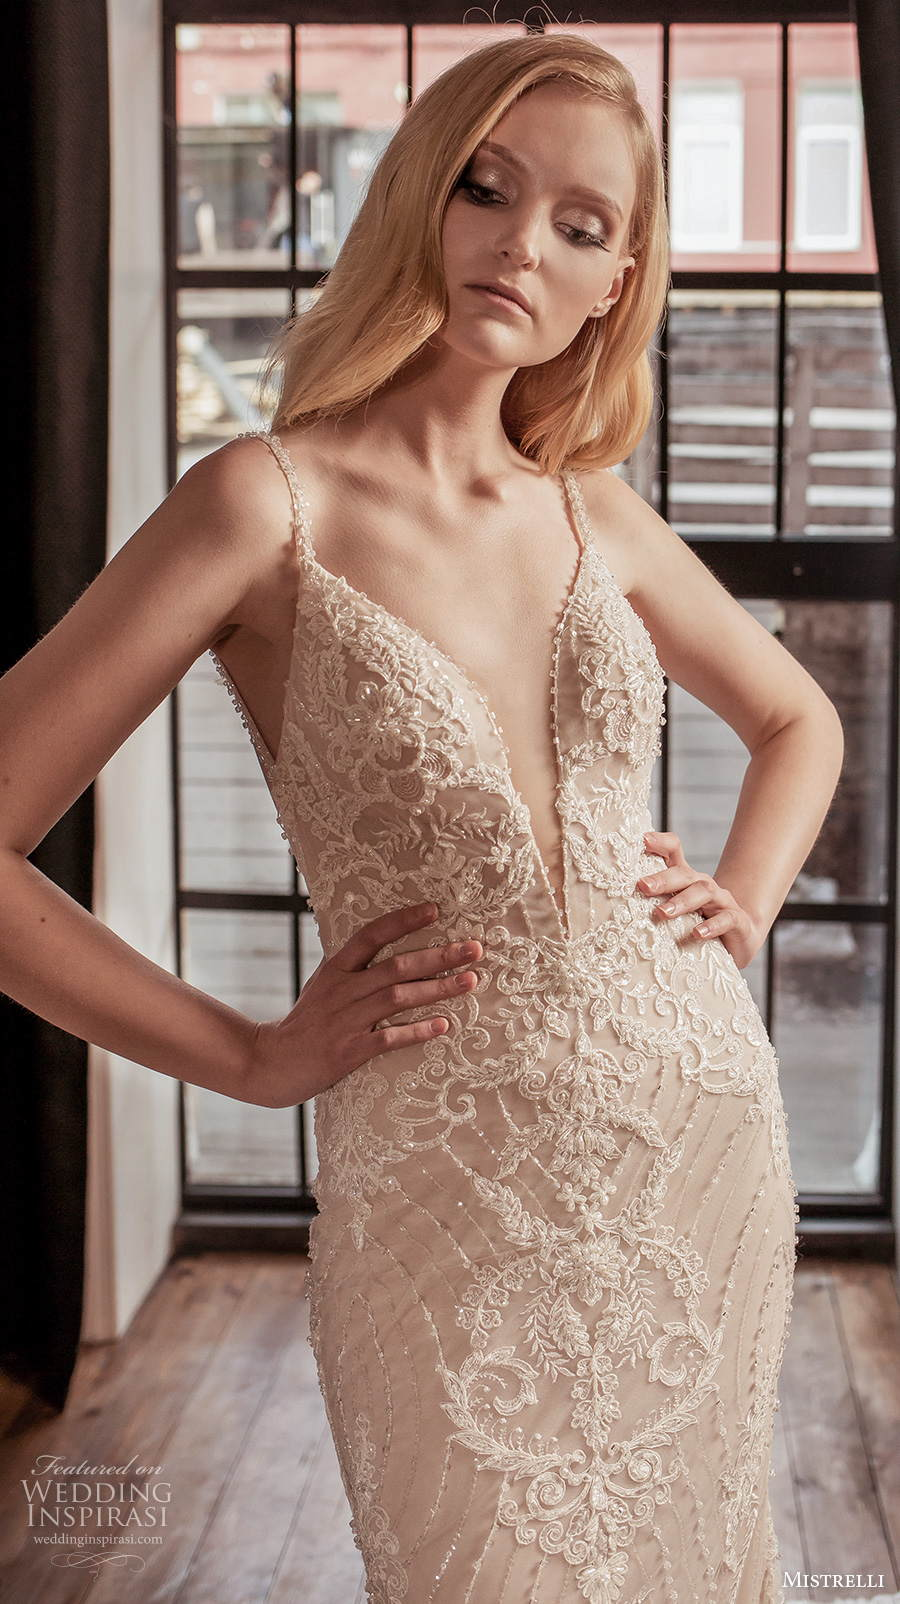 mistrelli 2021 royal drama bridal sleeveless thin strap deep sweetheart neckline full embellishment glamorous sheath wedding dress backless low back chapel train (9) zv